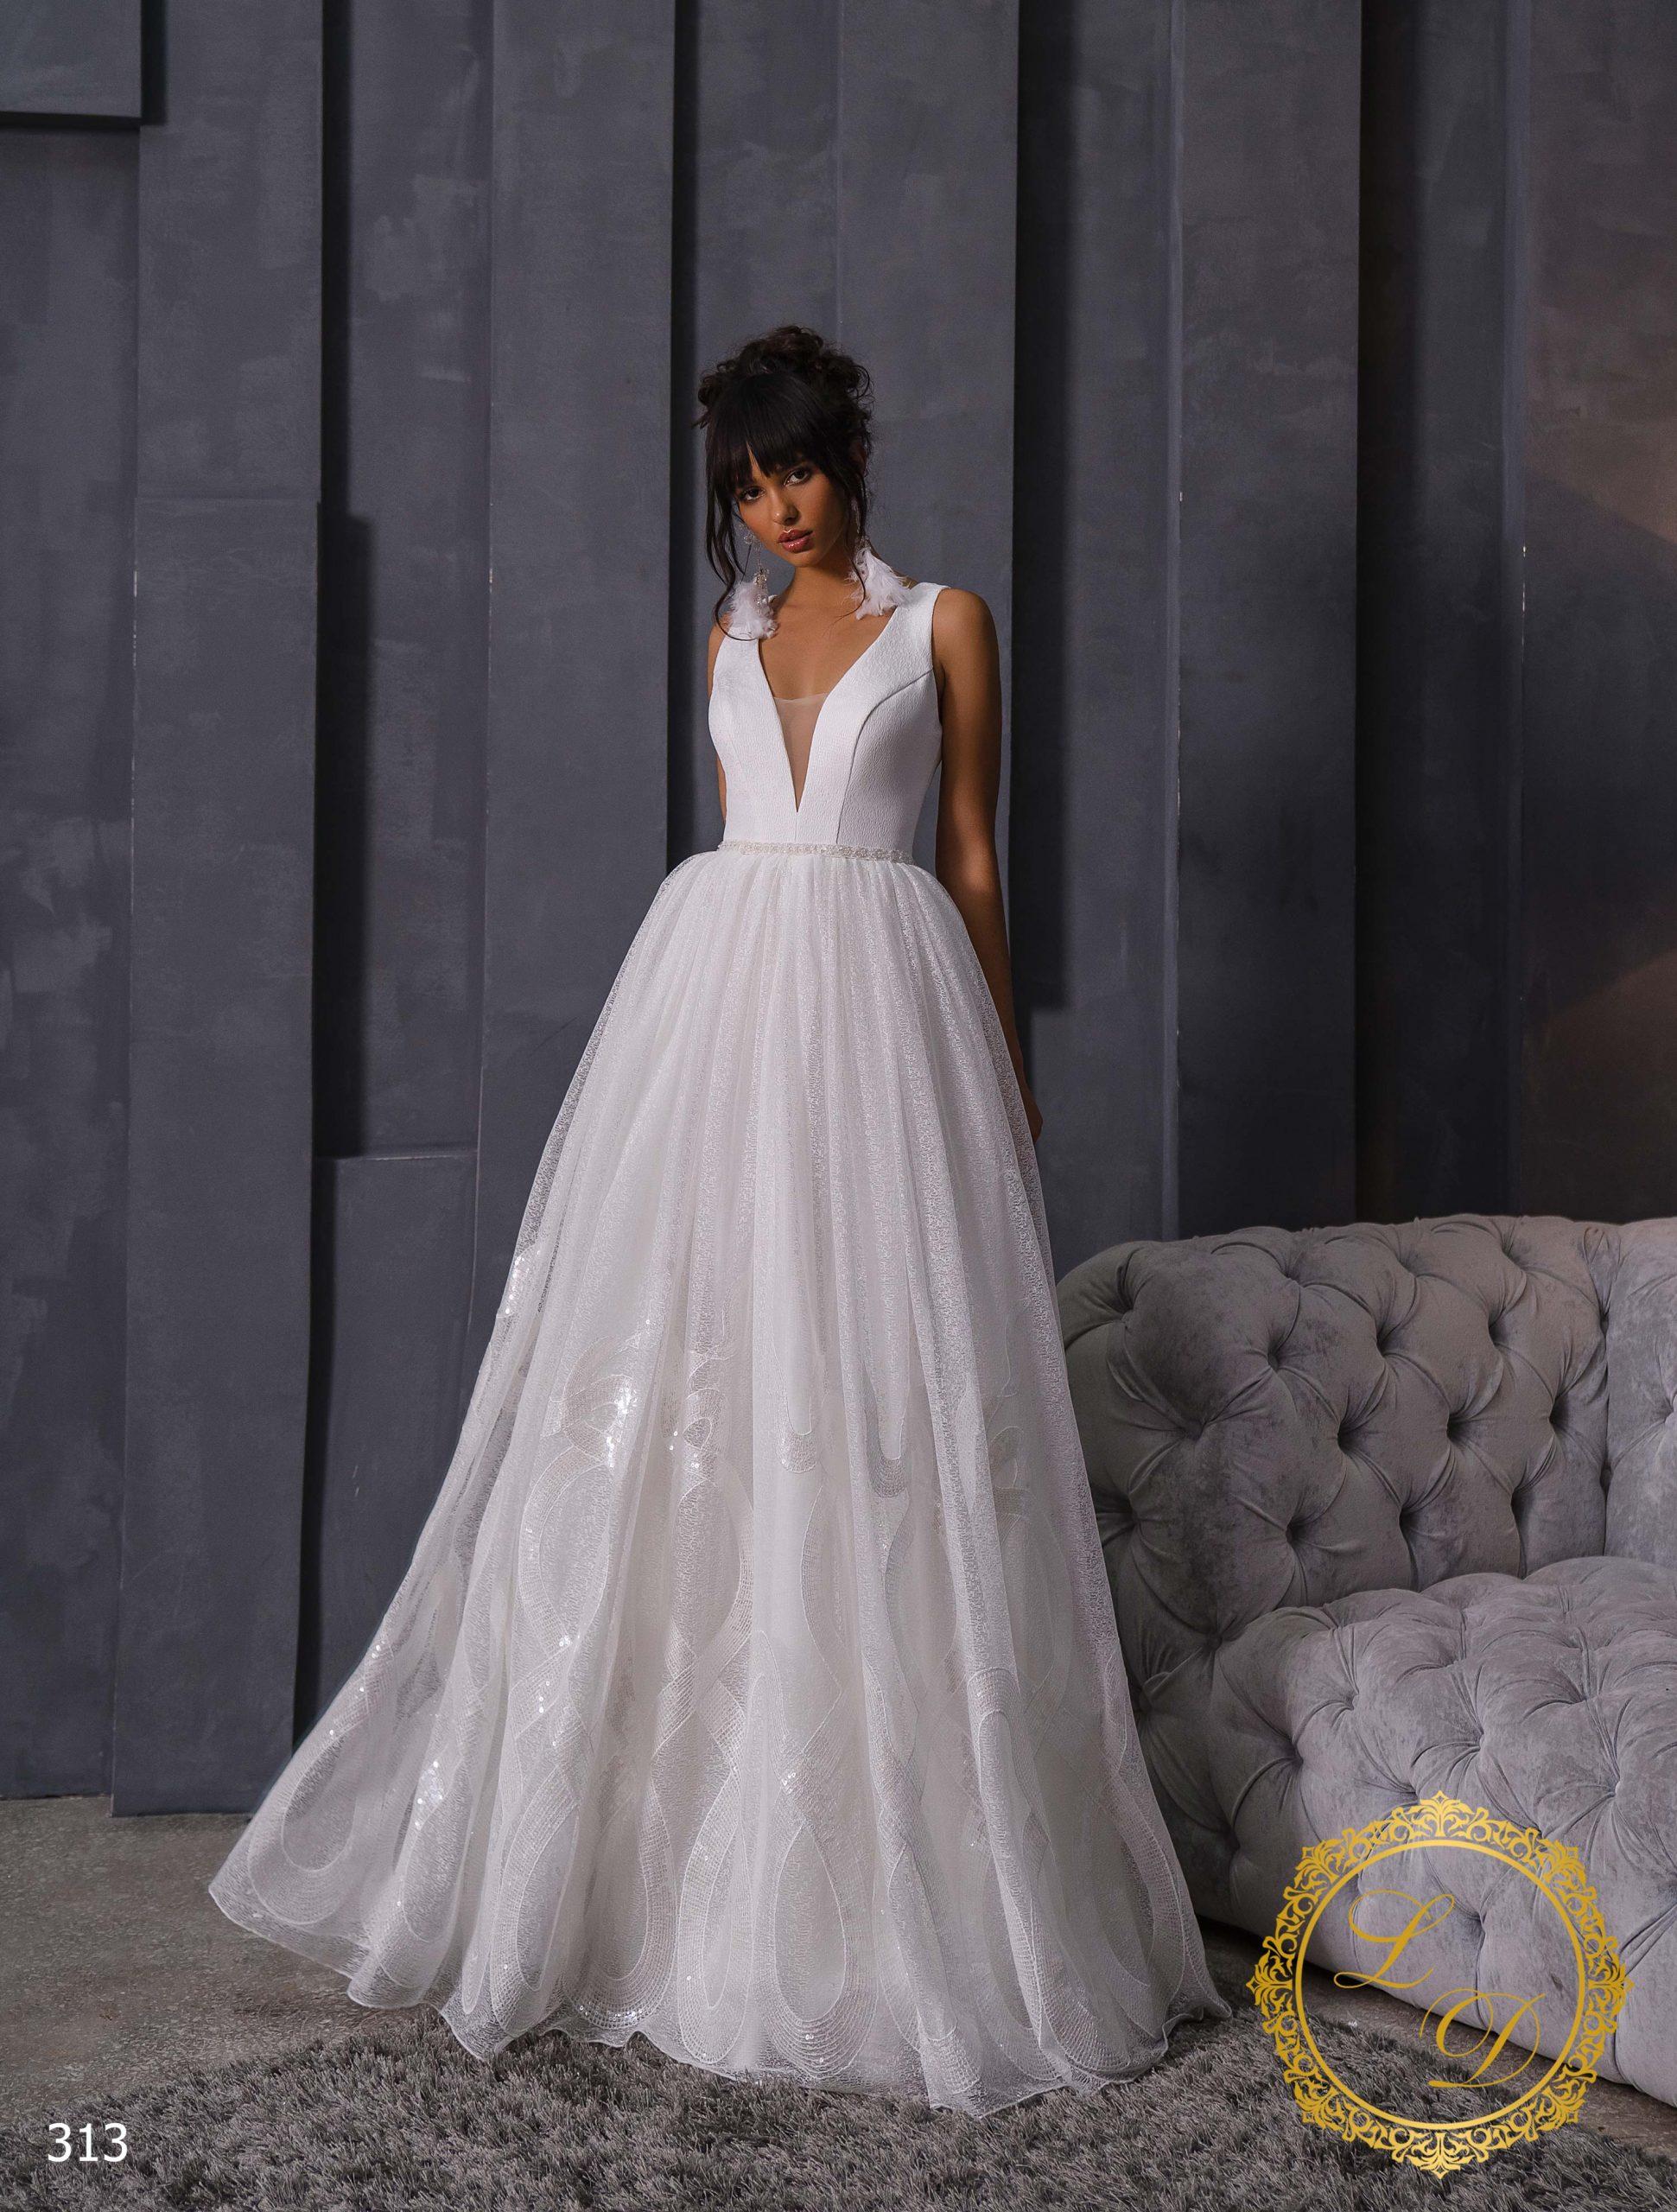 Wedding Dress Lady Di 313-1